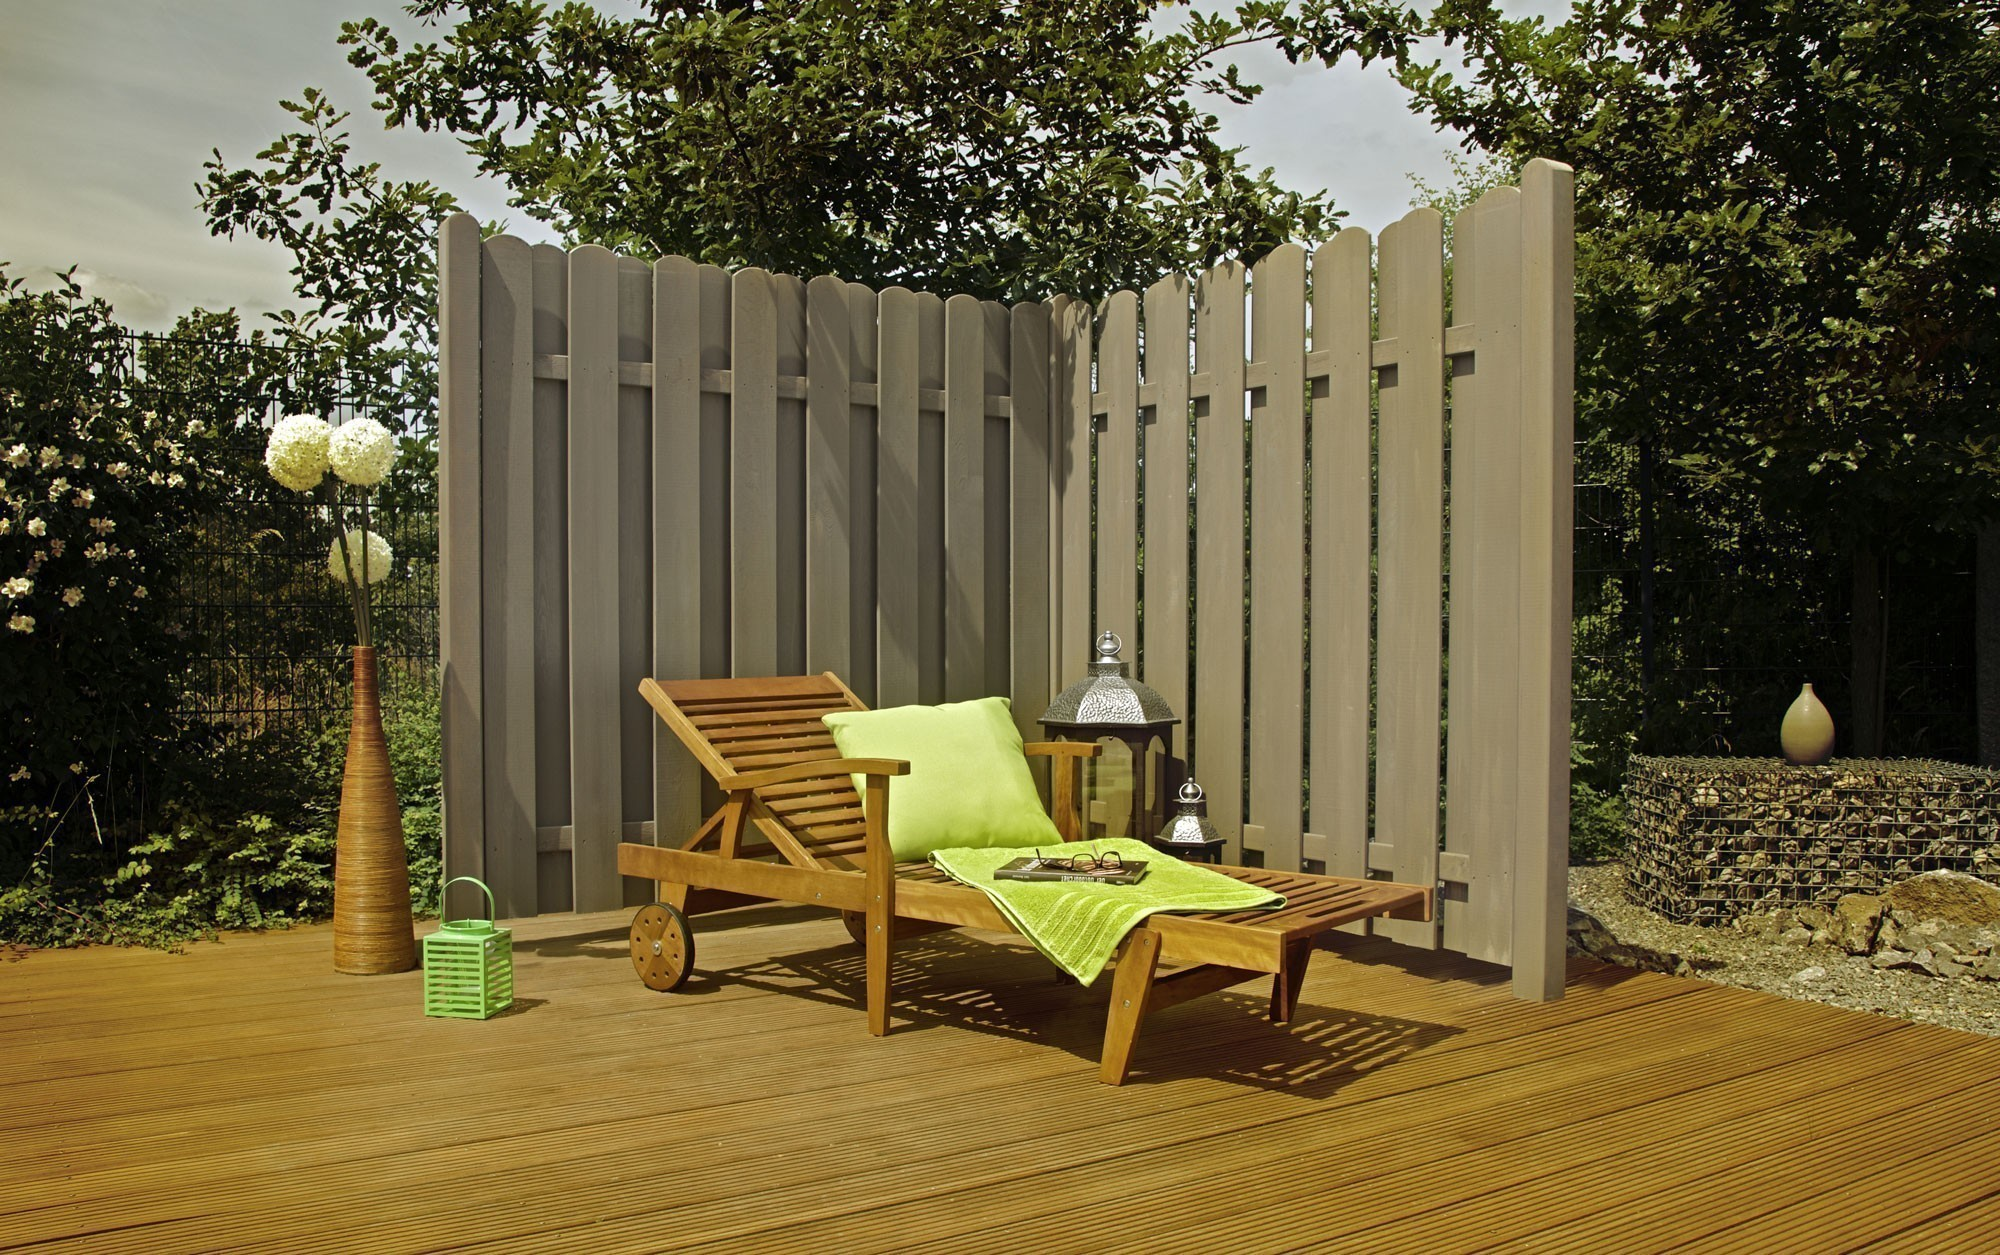 sichtschutzzaun tor kevin dimplex lasiert grey nature 90x180 160cm bei. Black Bedroom Furniture Sets. Home Design Ideas